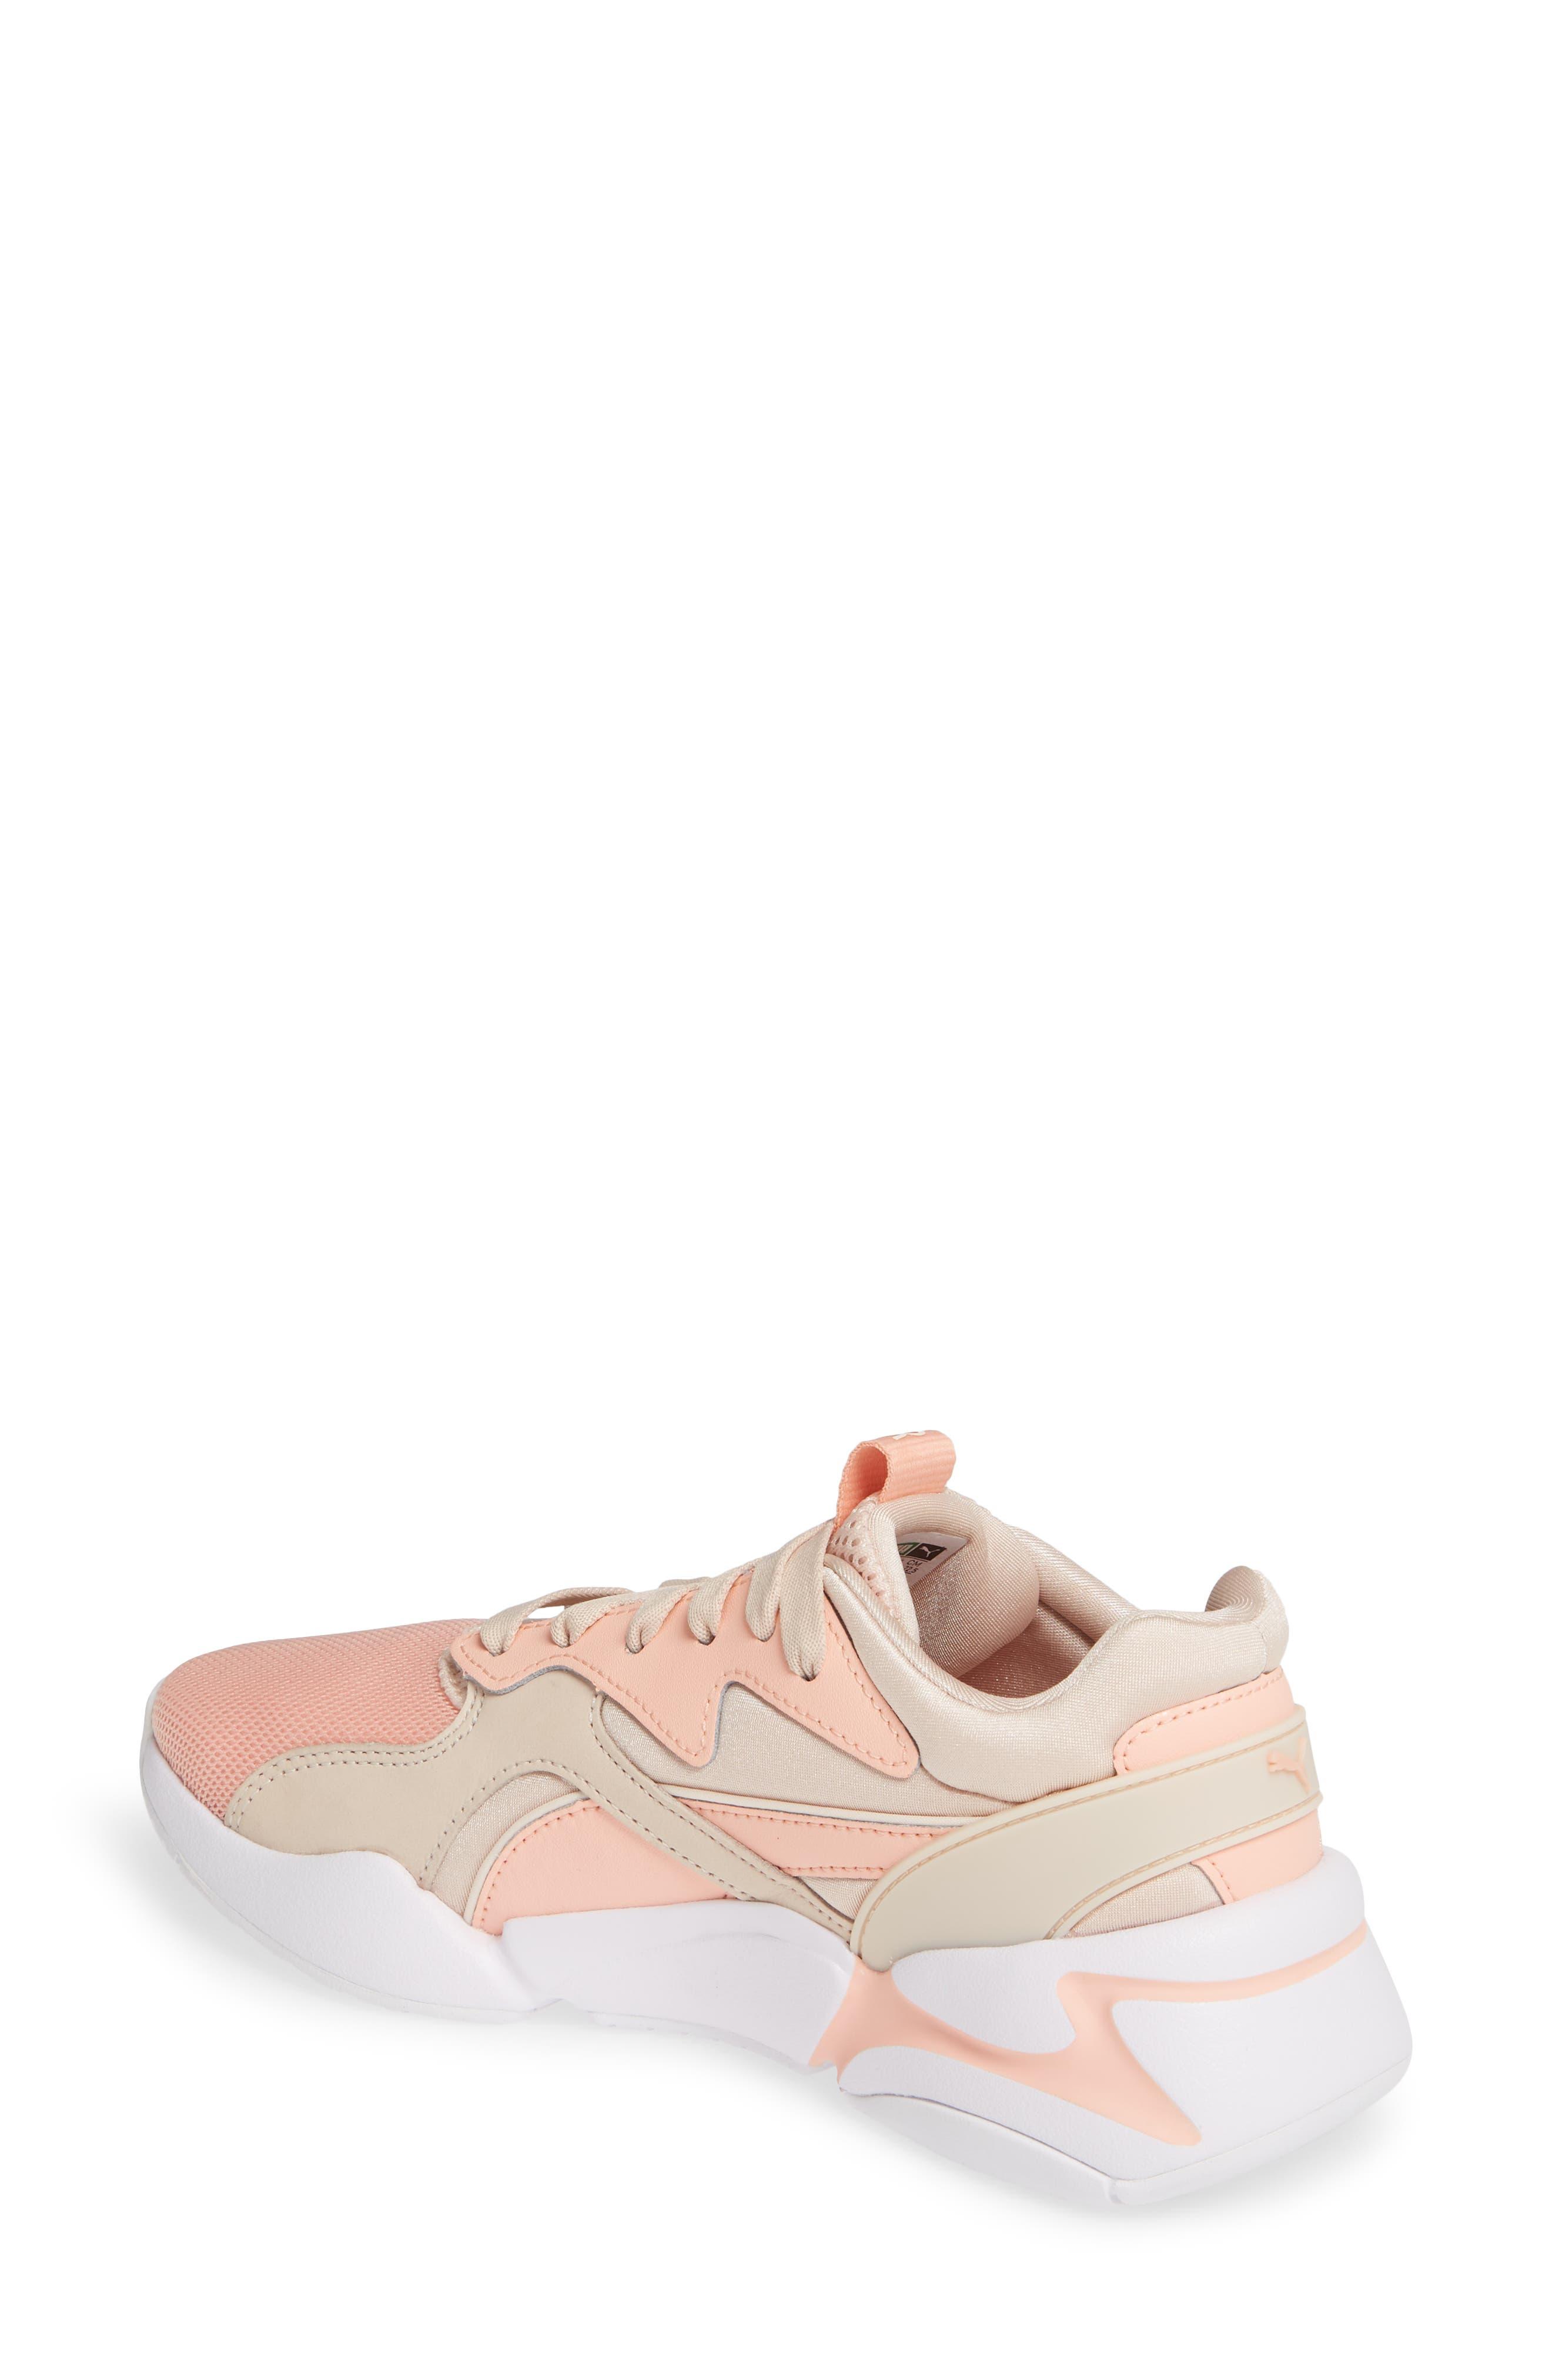 PUMA, Nova GRL PWR Sneaker, Alternate thumbnail 2, color, PEACH BUD/ PEARL BLUSH